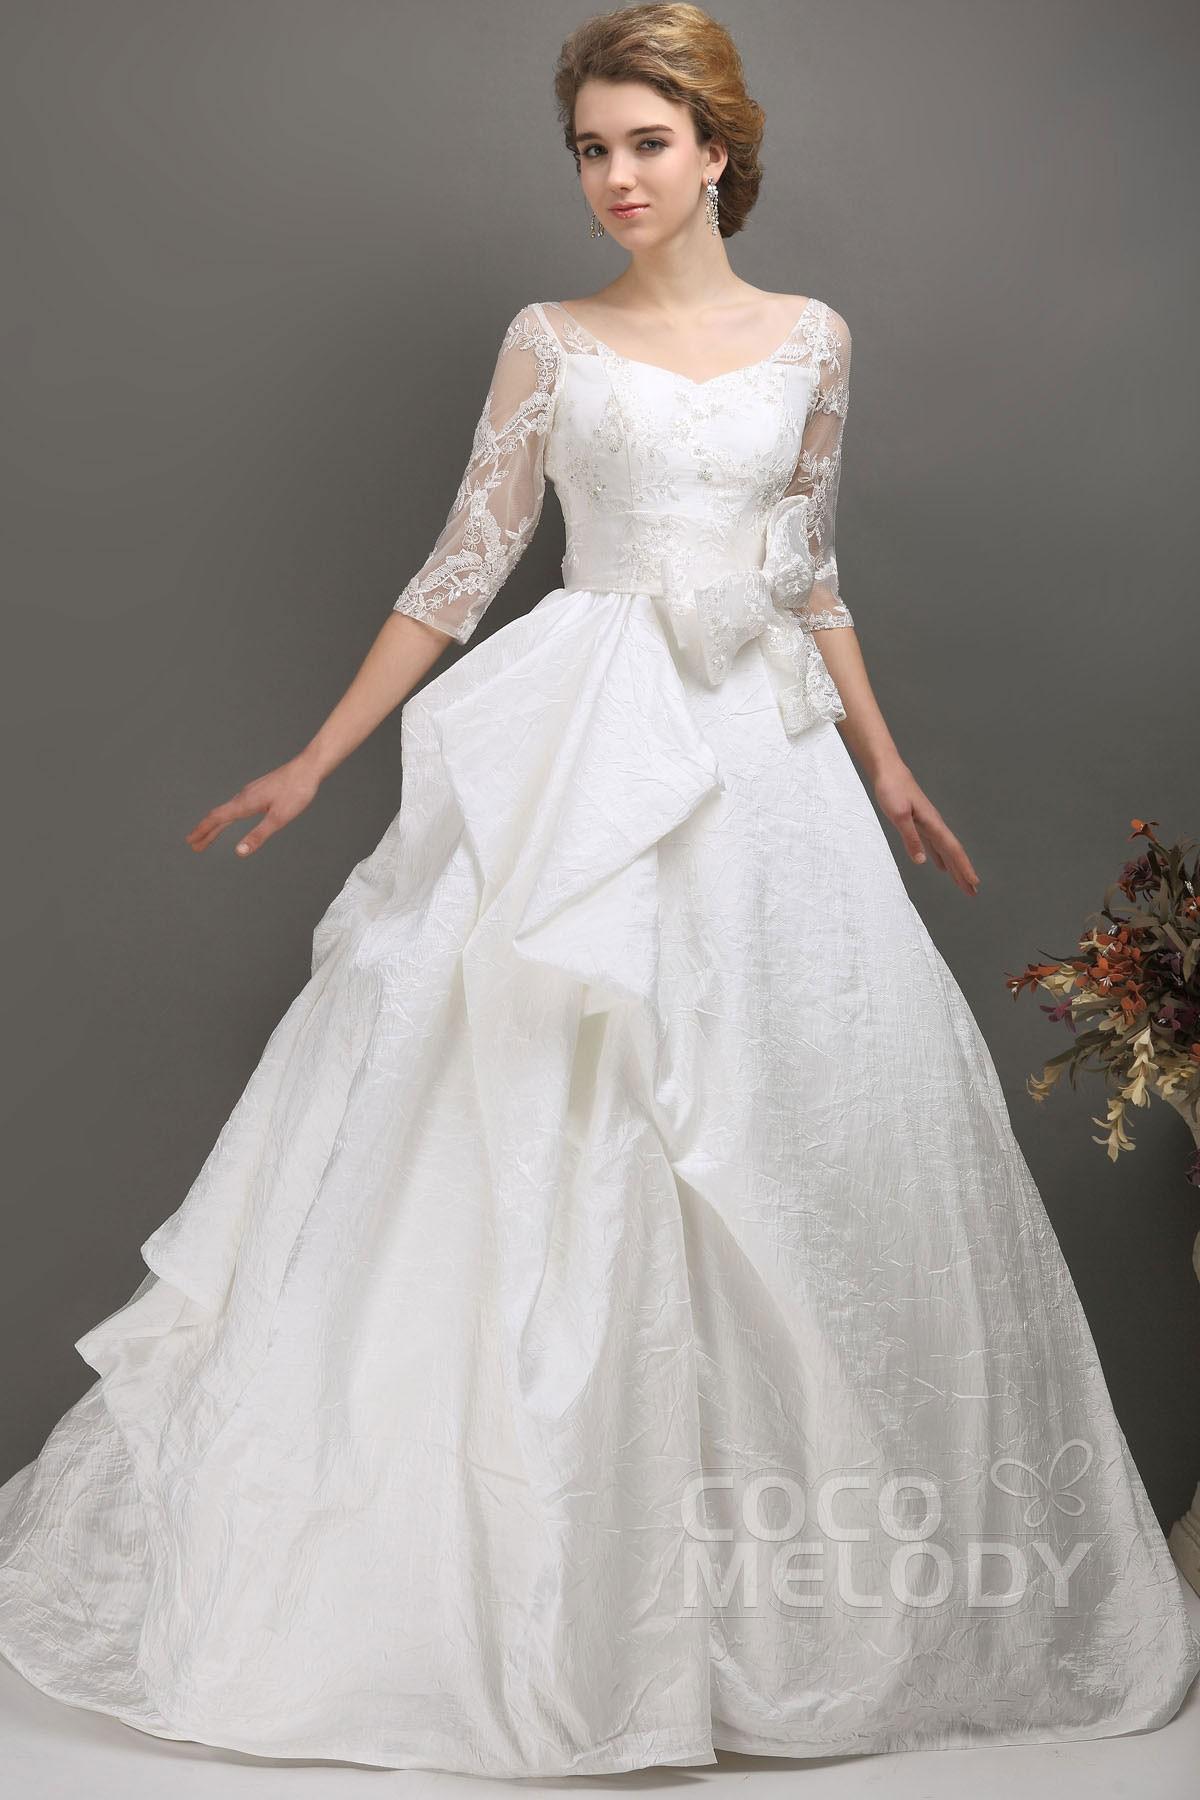 Glorious Ivory Half Sleeve Chapel Train Taffeta Key Hole Wedding Dress CWLT13065